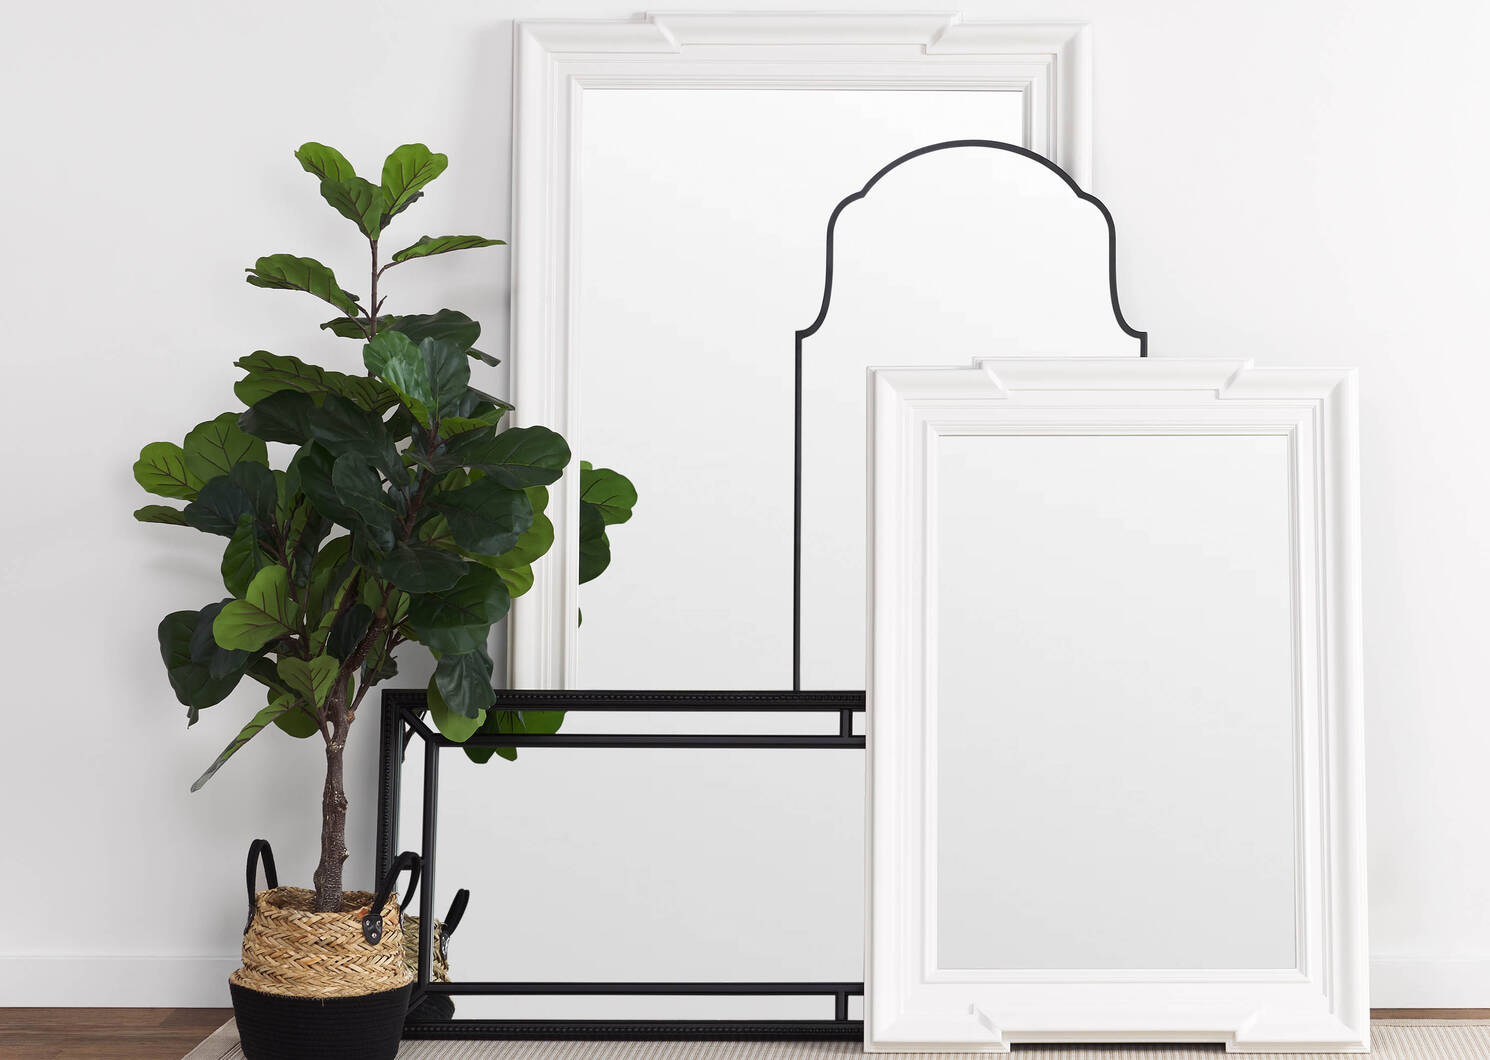 Miroir posé contre le mur Gatlin